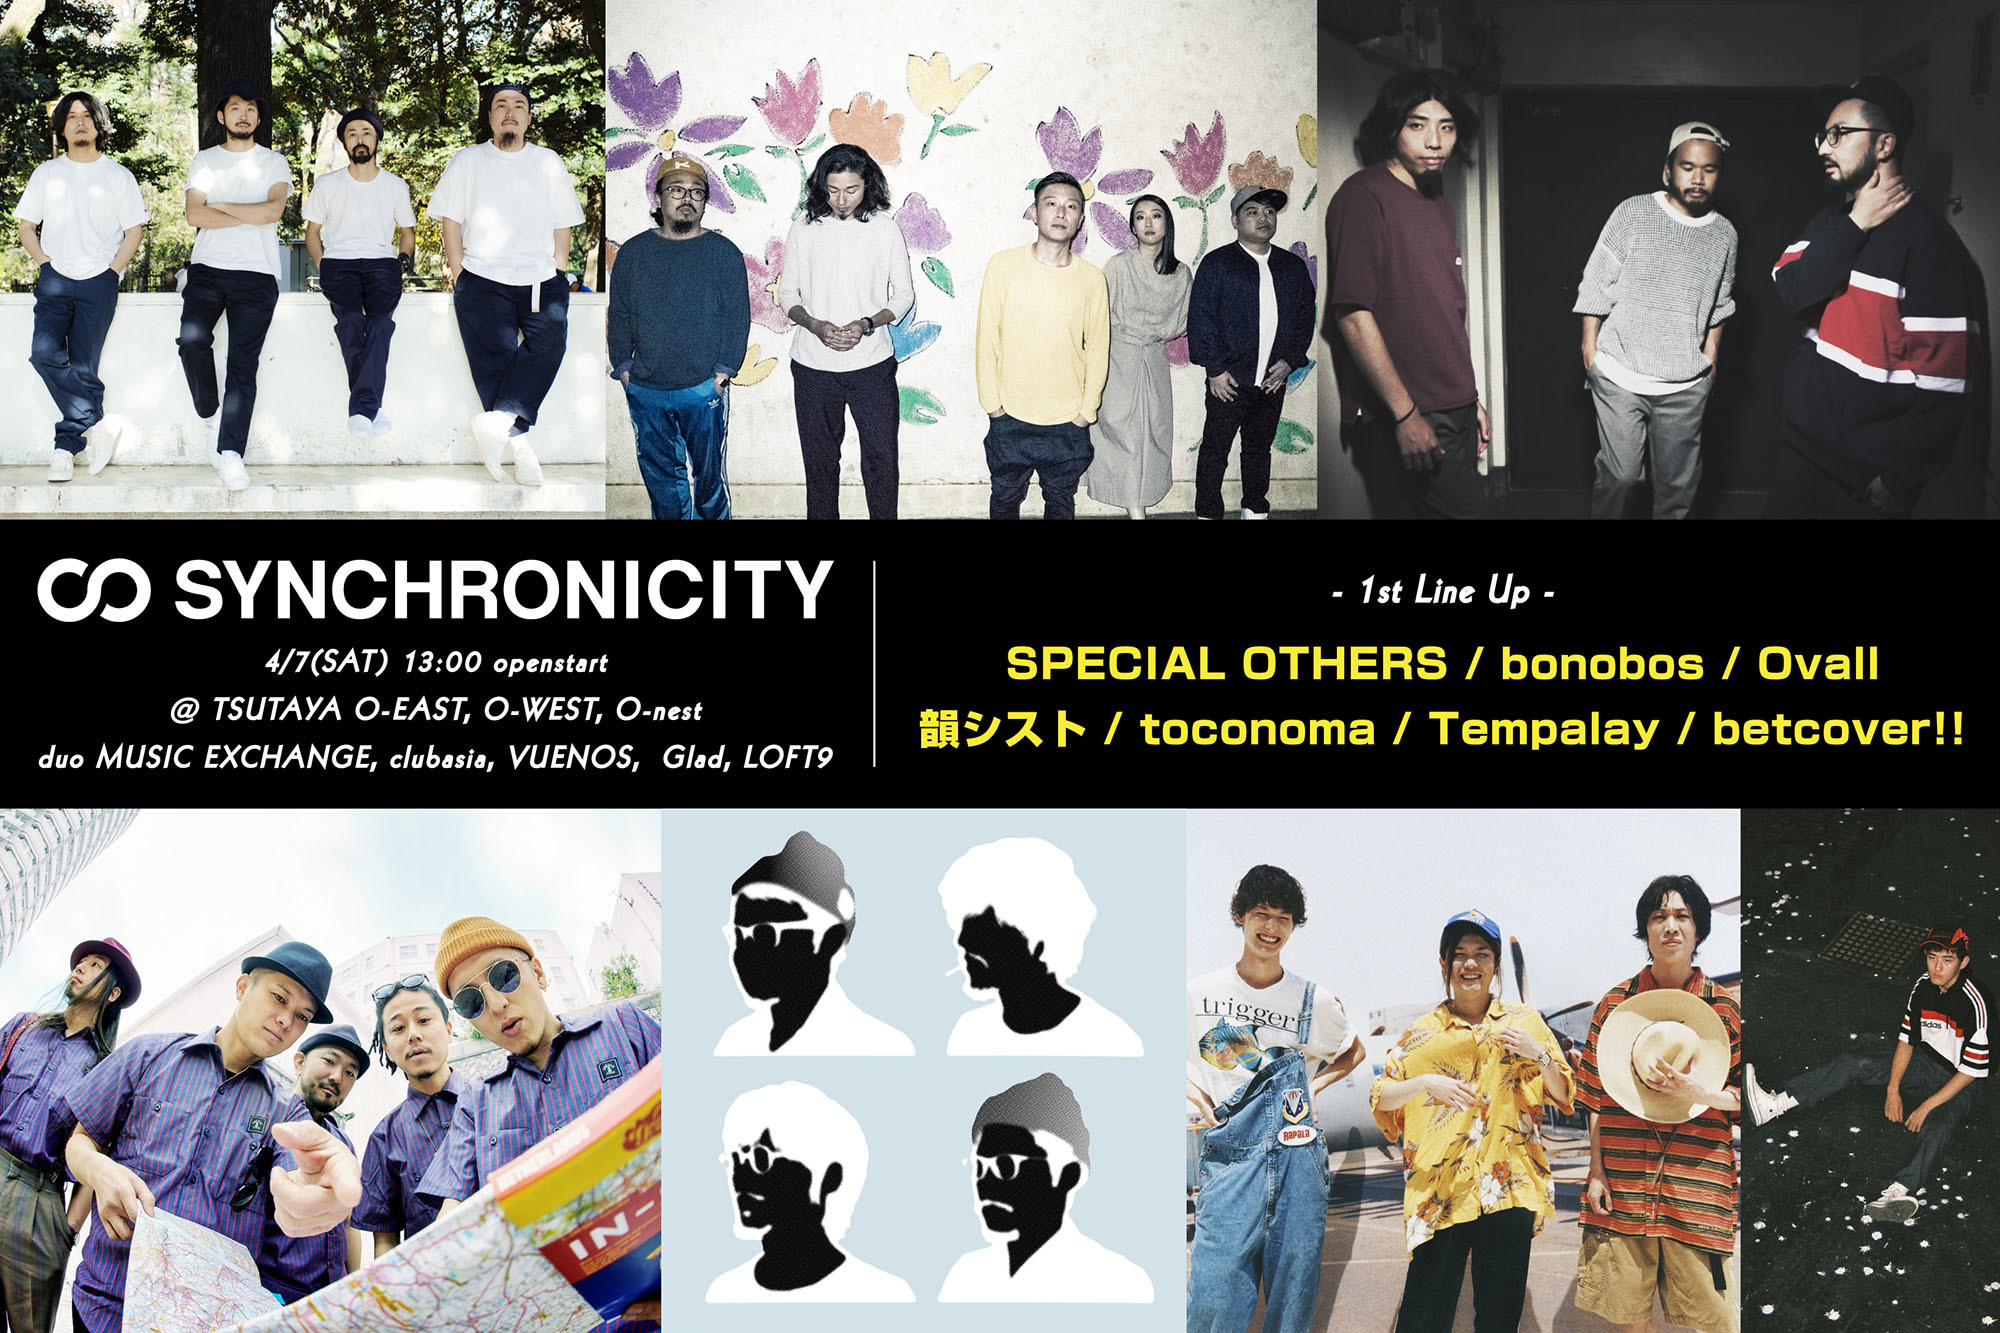 SYNCHRONICITY'18